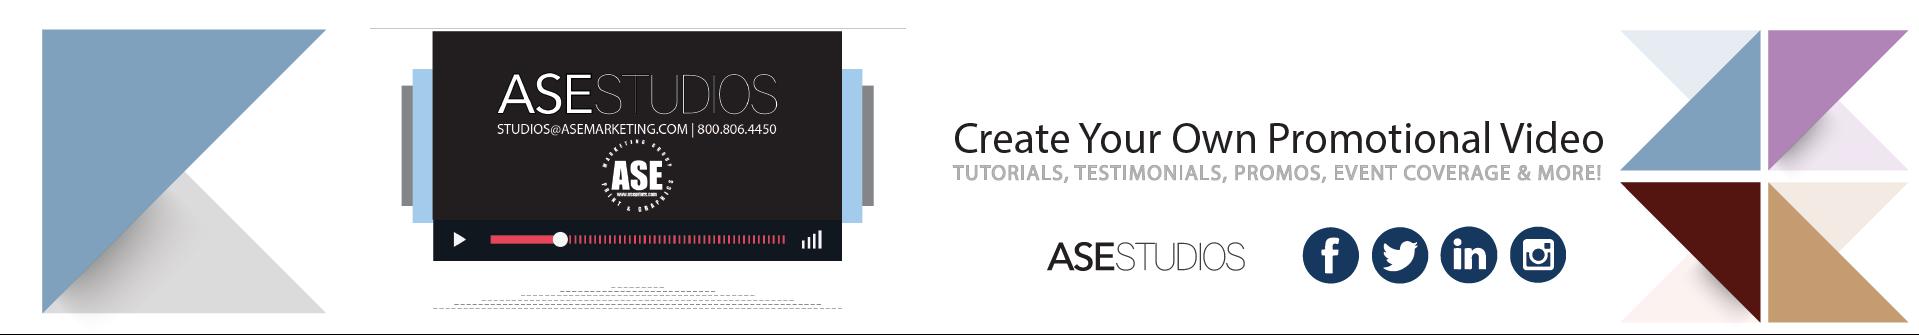 ASE STUDIOS